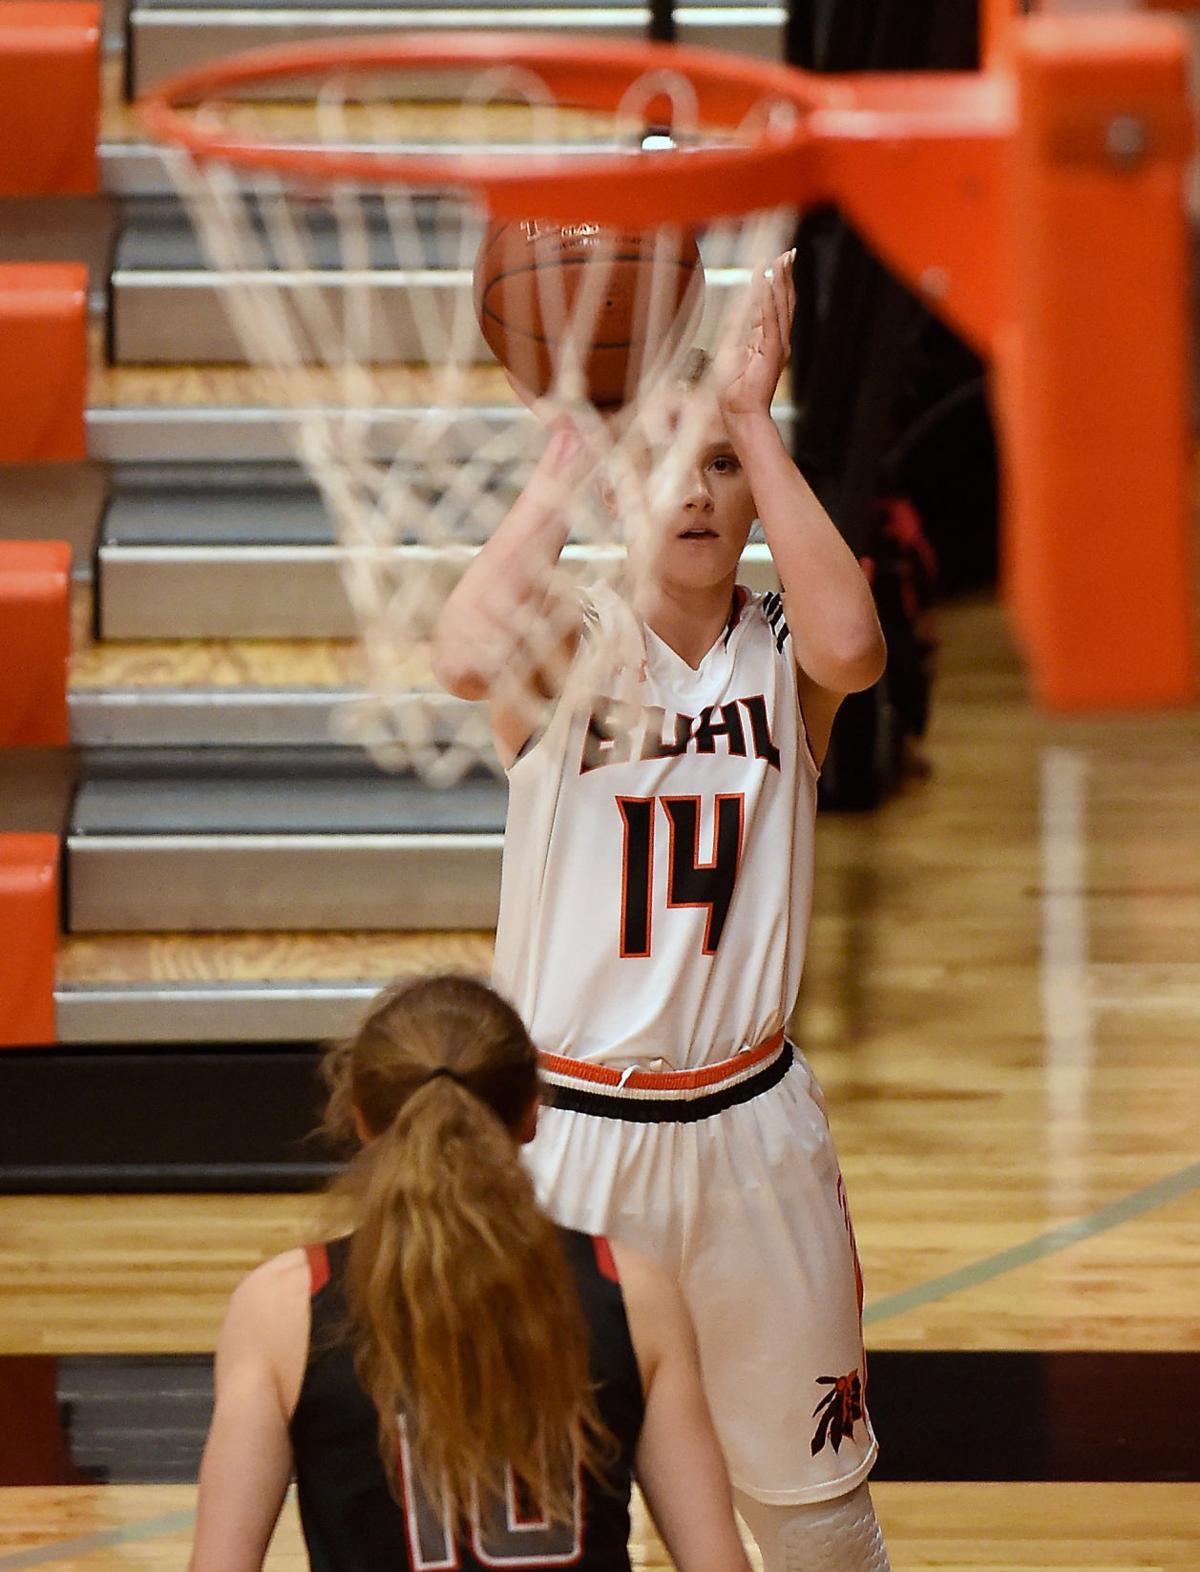 Girls Basketball - Gooding Vs. Buhl